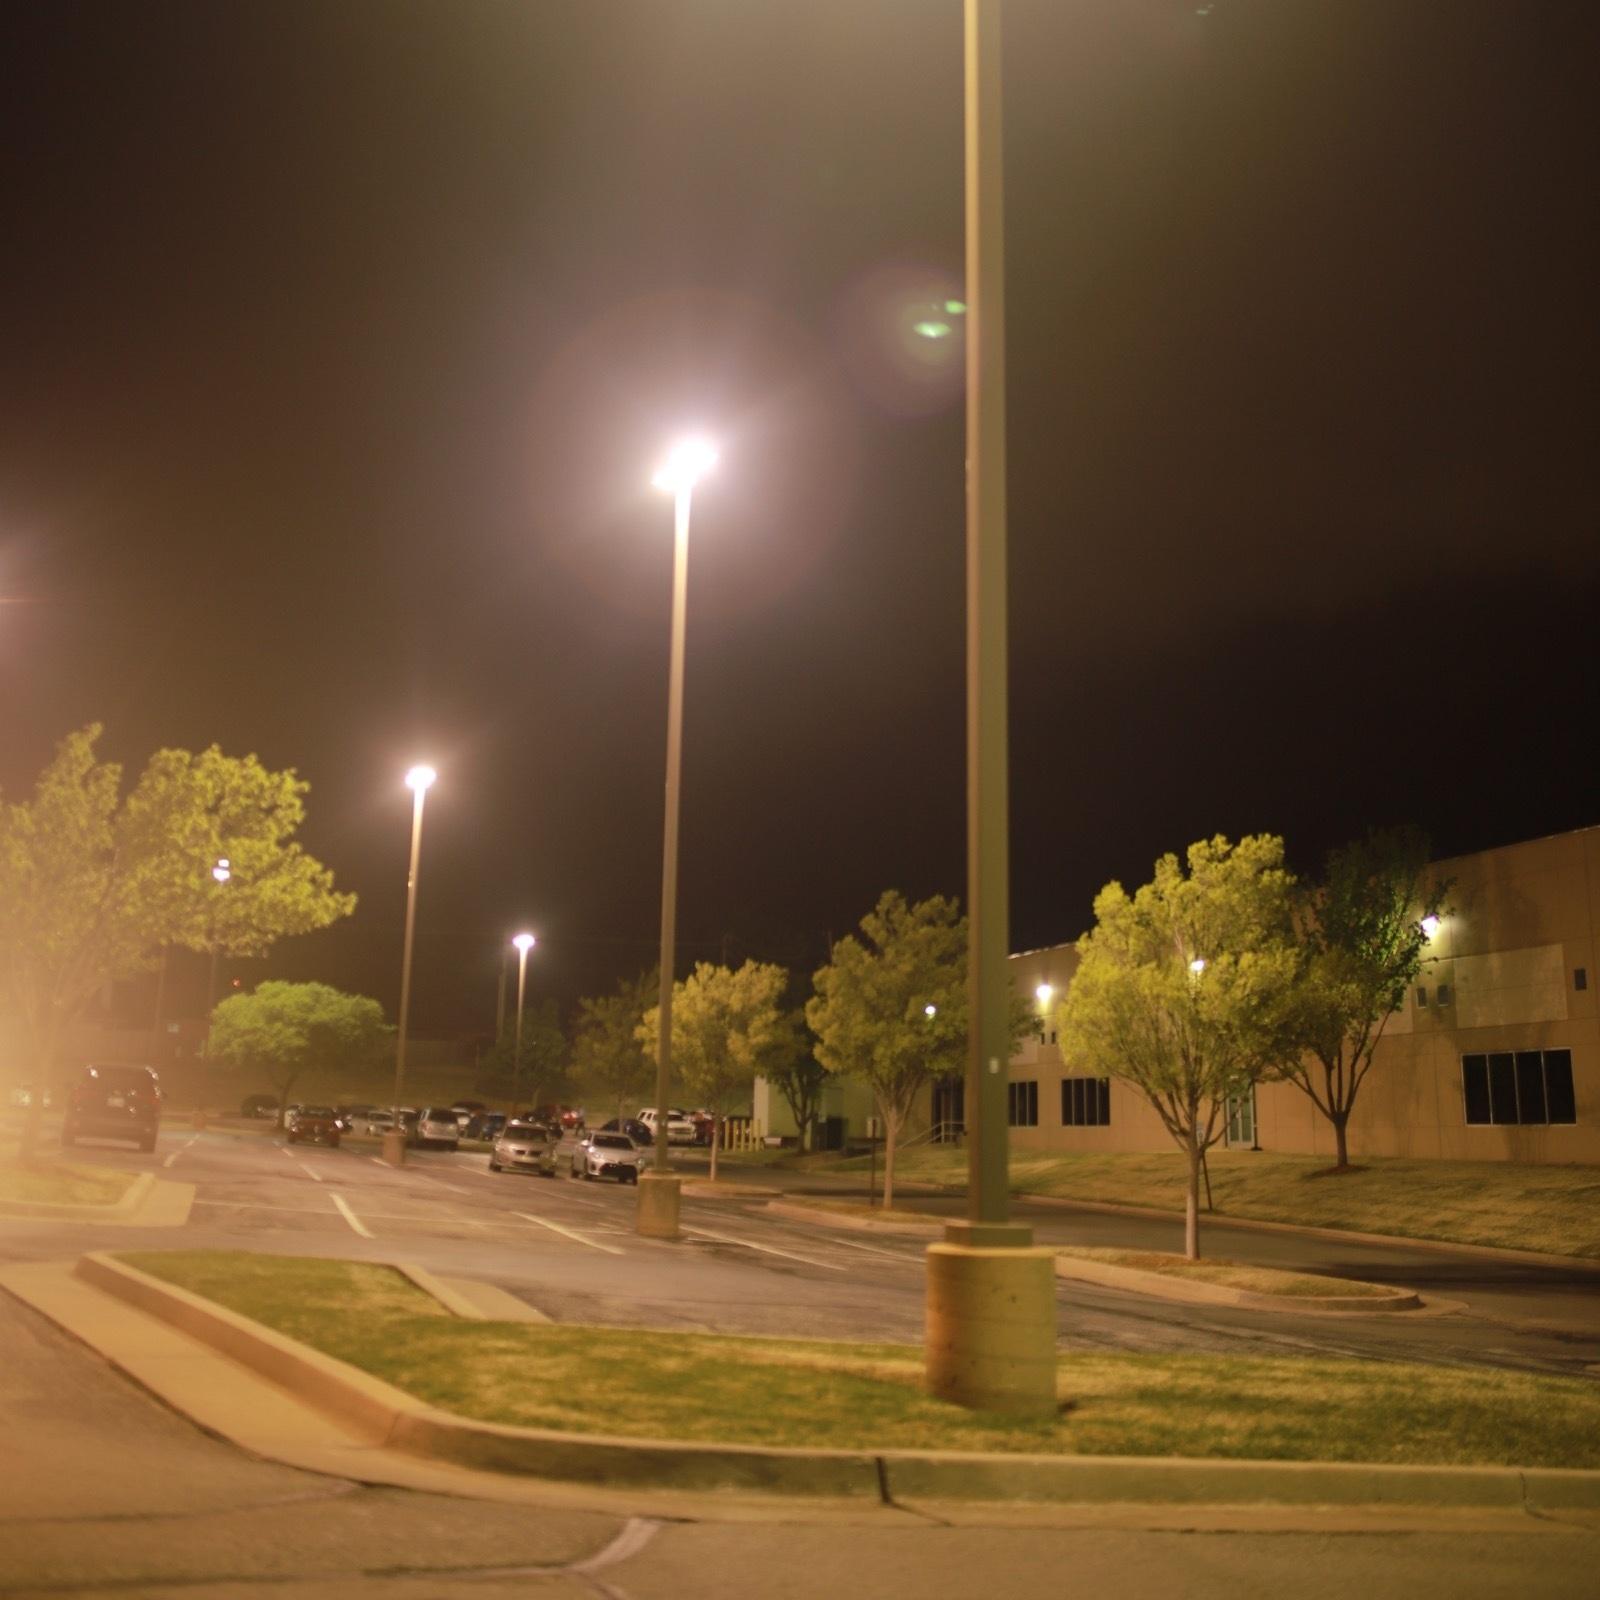 Copy+of+Sprint+Light+Pole.jpg